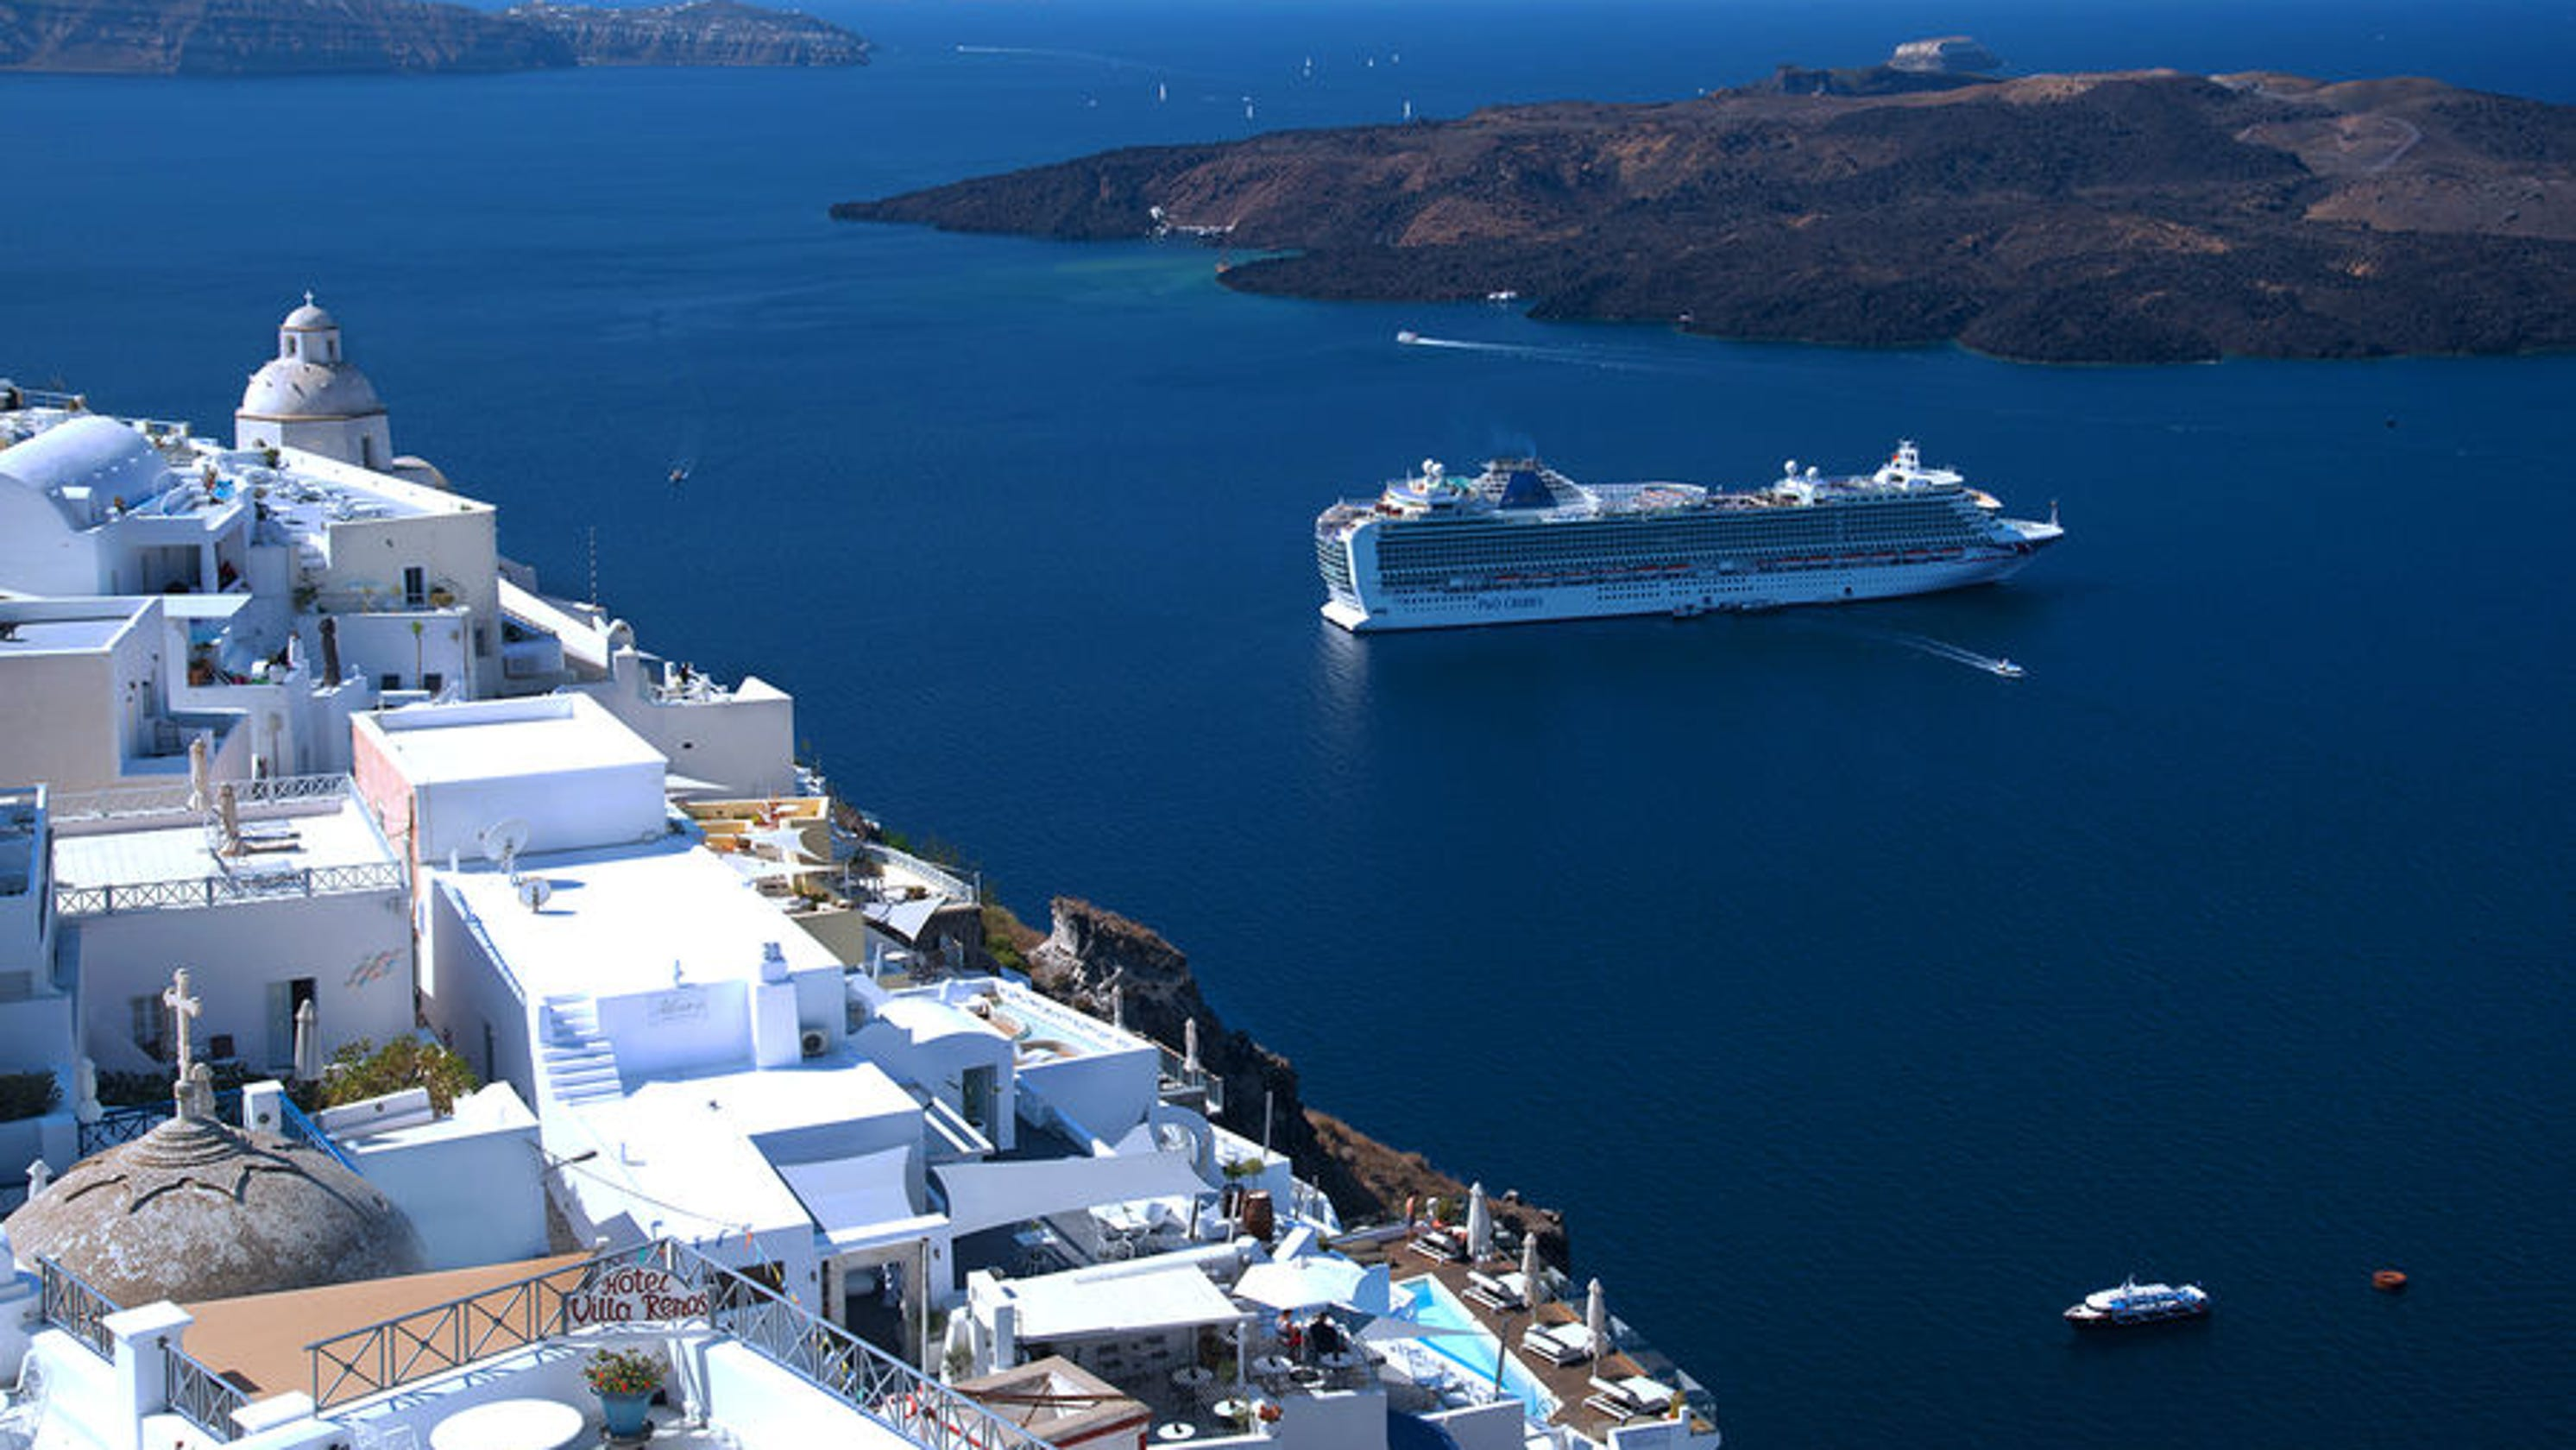 Rick Steves' tips for European cruises: Eat in port, explore on your own, enjoy a sunrise